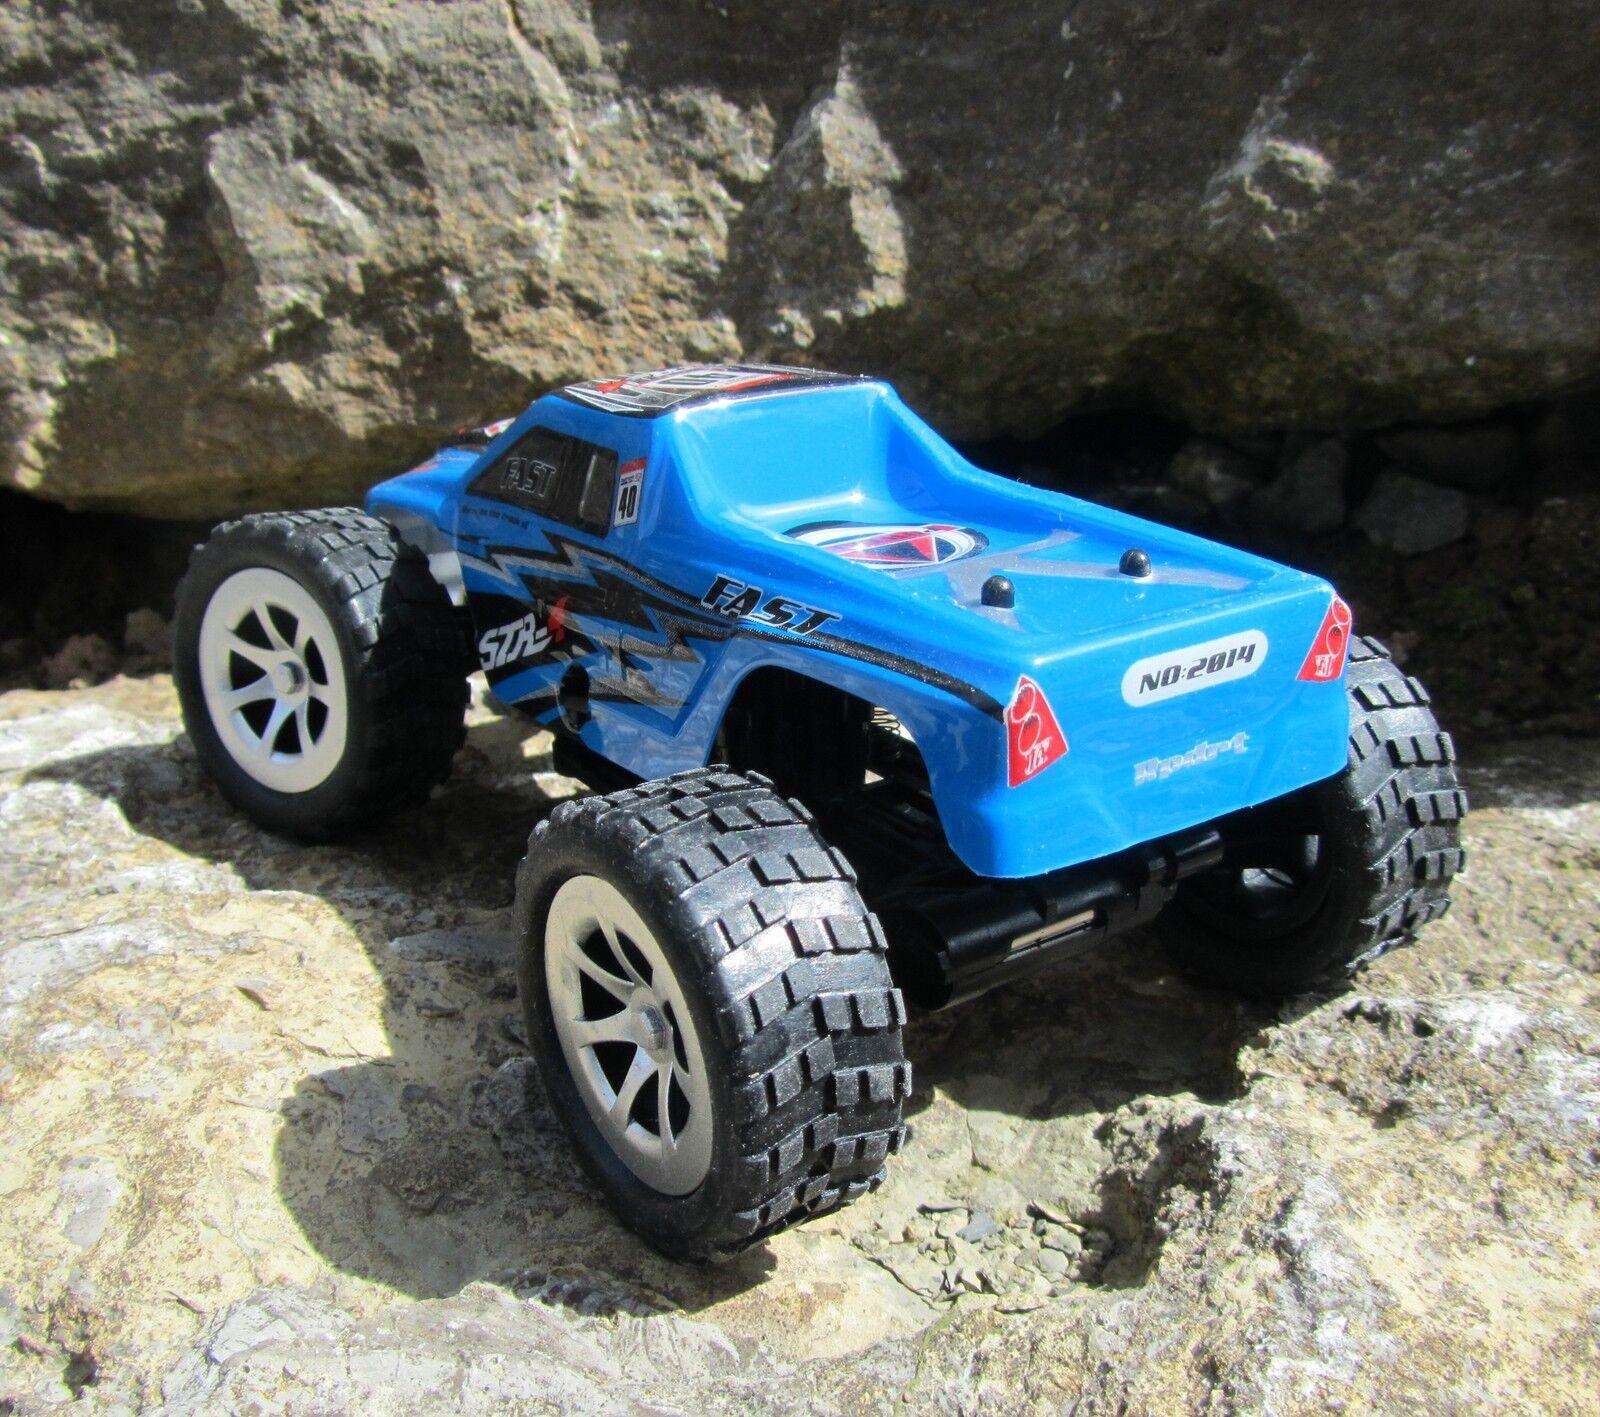 Ferngesteuert Modell XT-Cars Trusher Trusher Trusher 15cm Länge 1 24 RC Auto 2 4 GHz 50110 b3929d